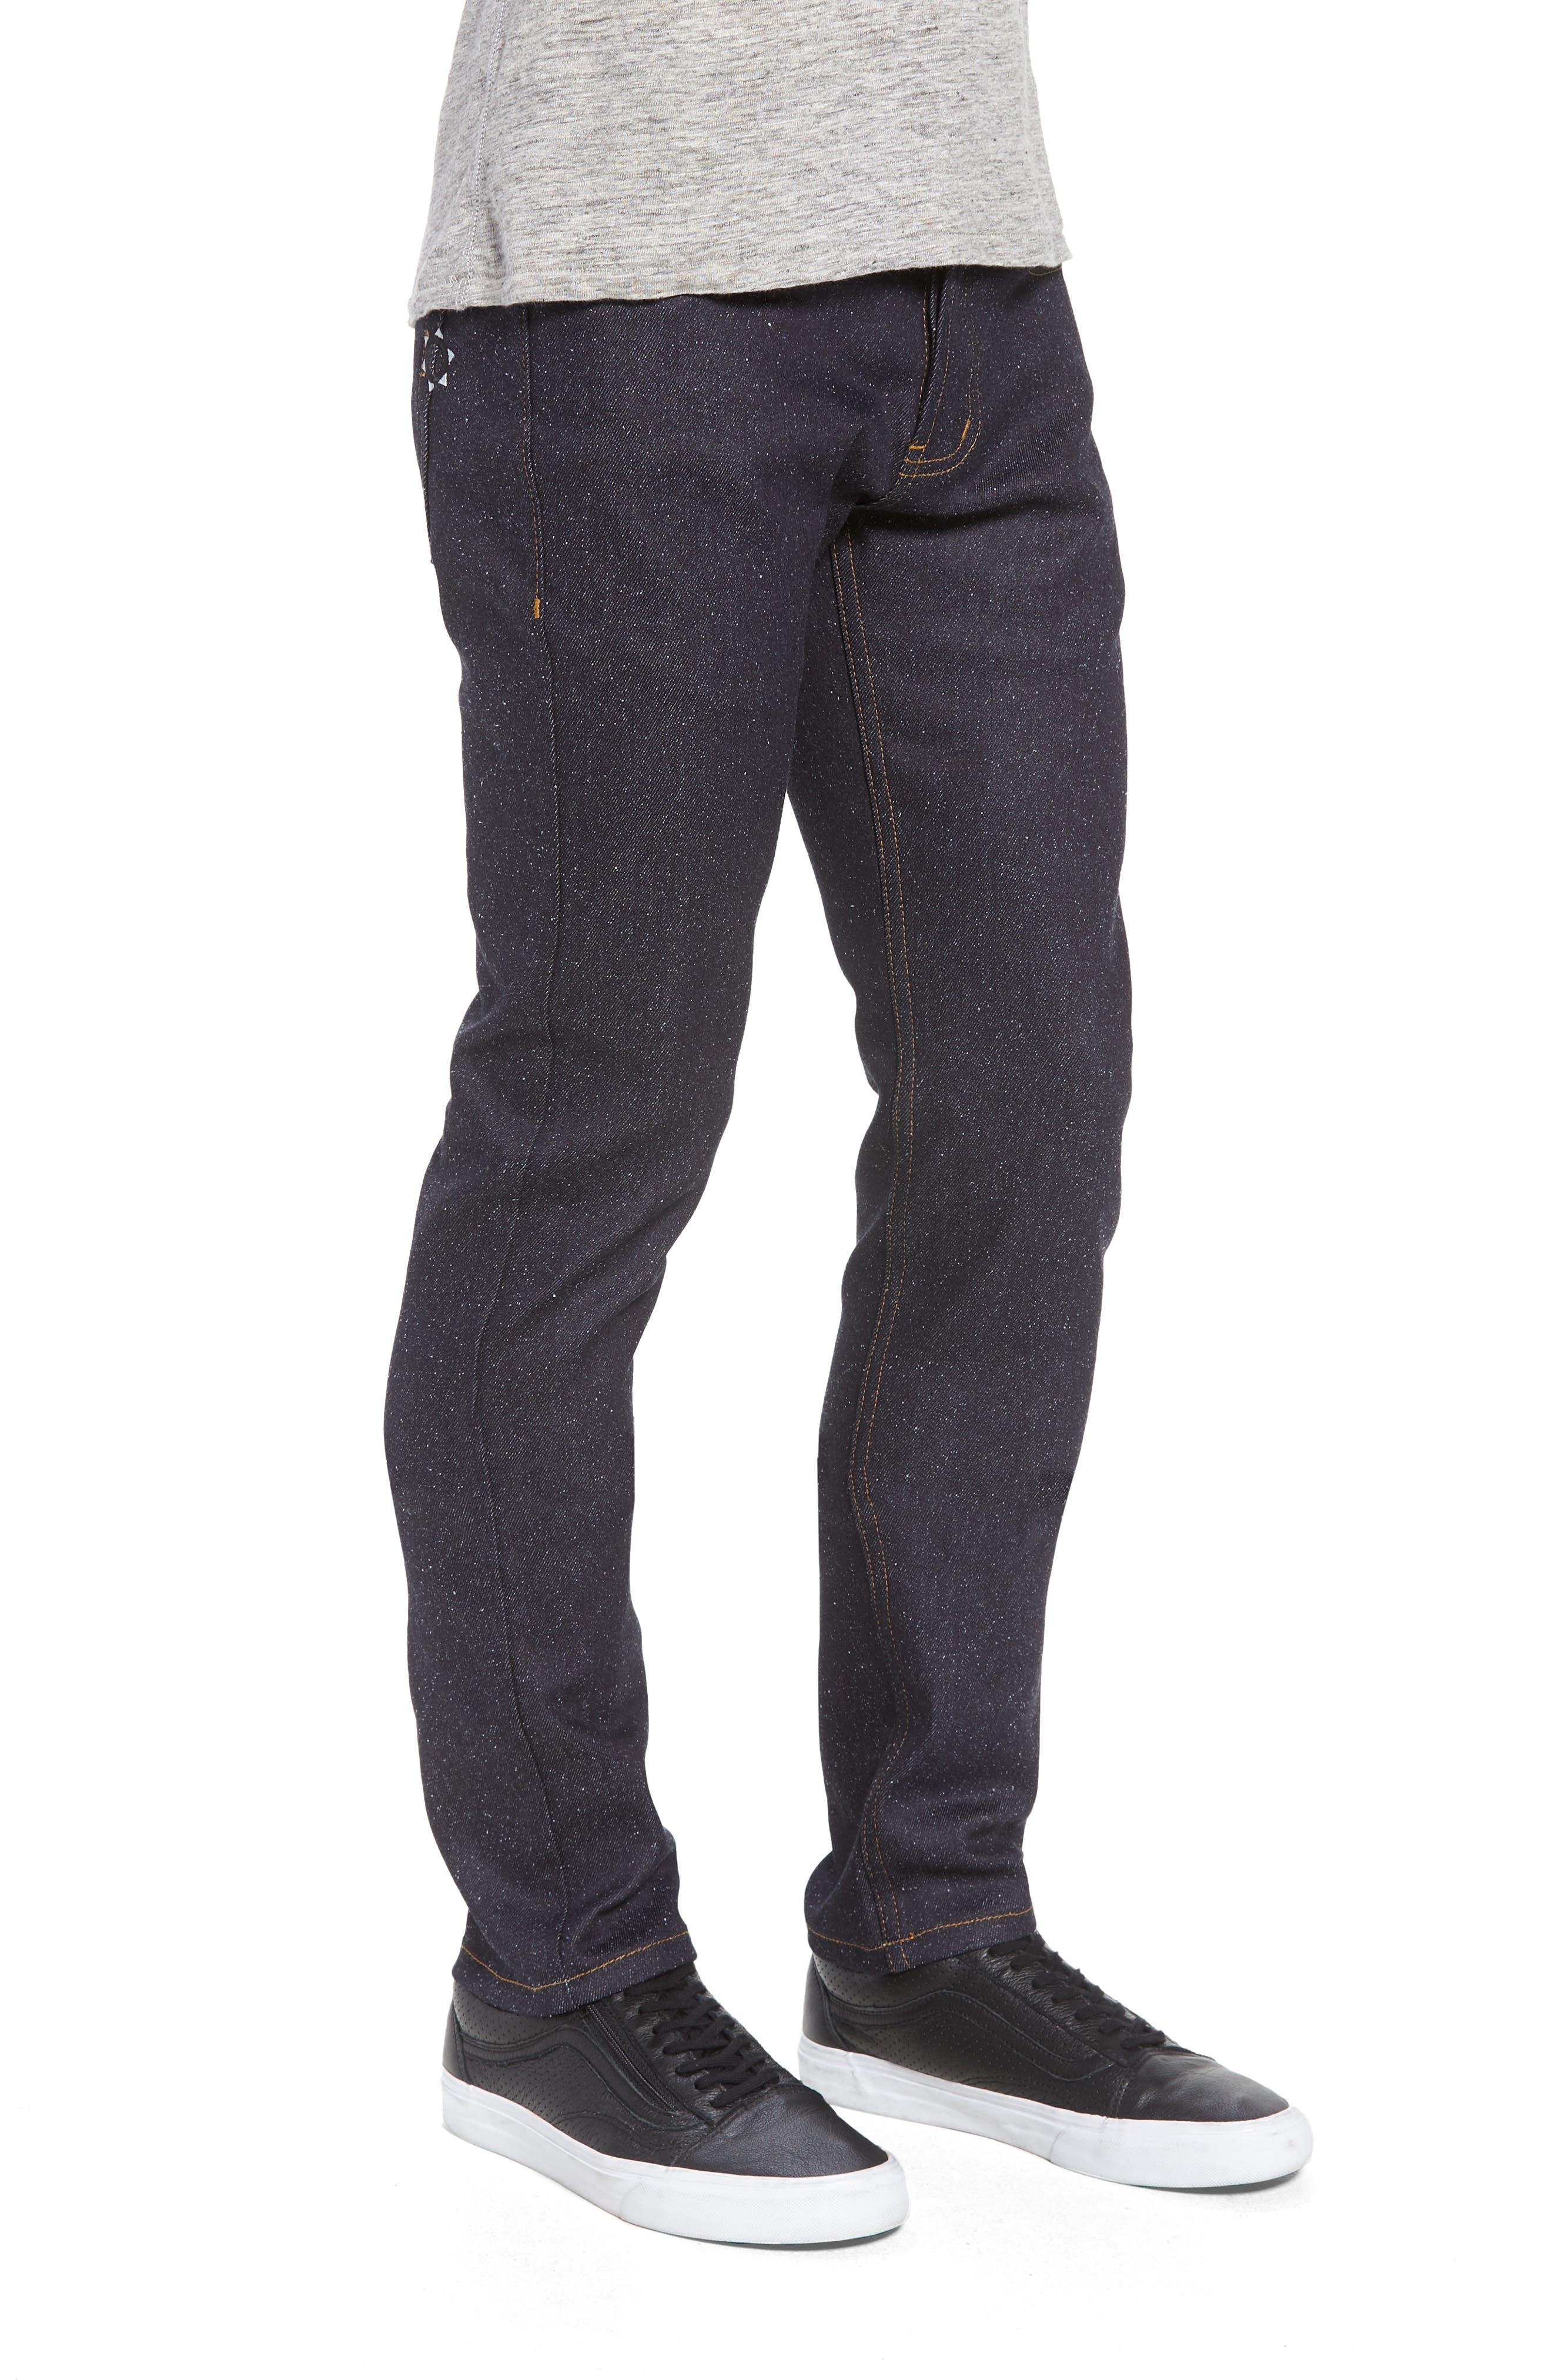 Super Skinny Guy Skinny Fit Jeans,                             Alternate thumbnail 3, color,                             Indigo